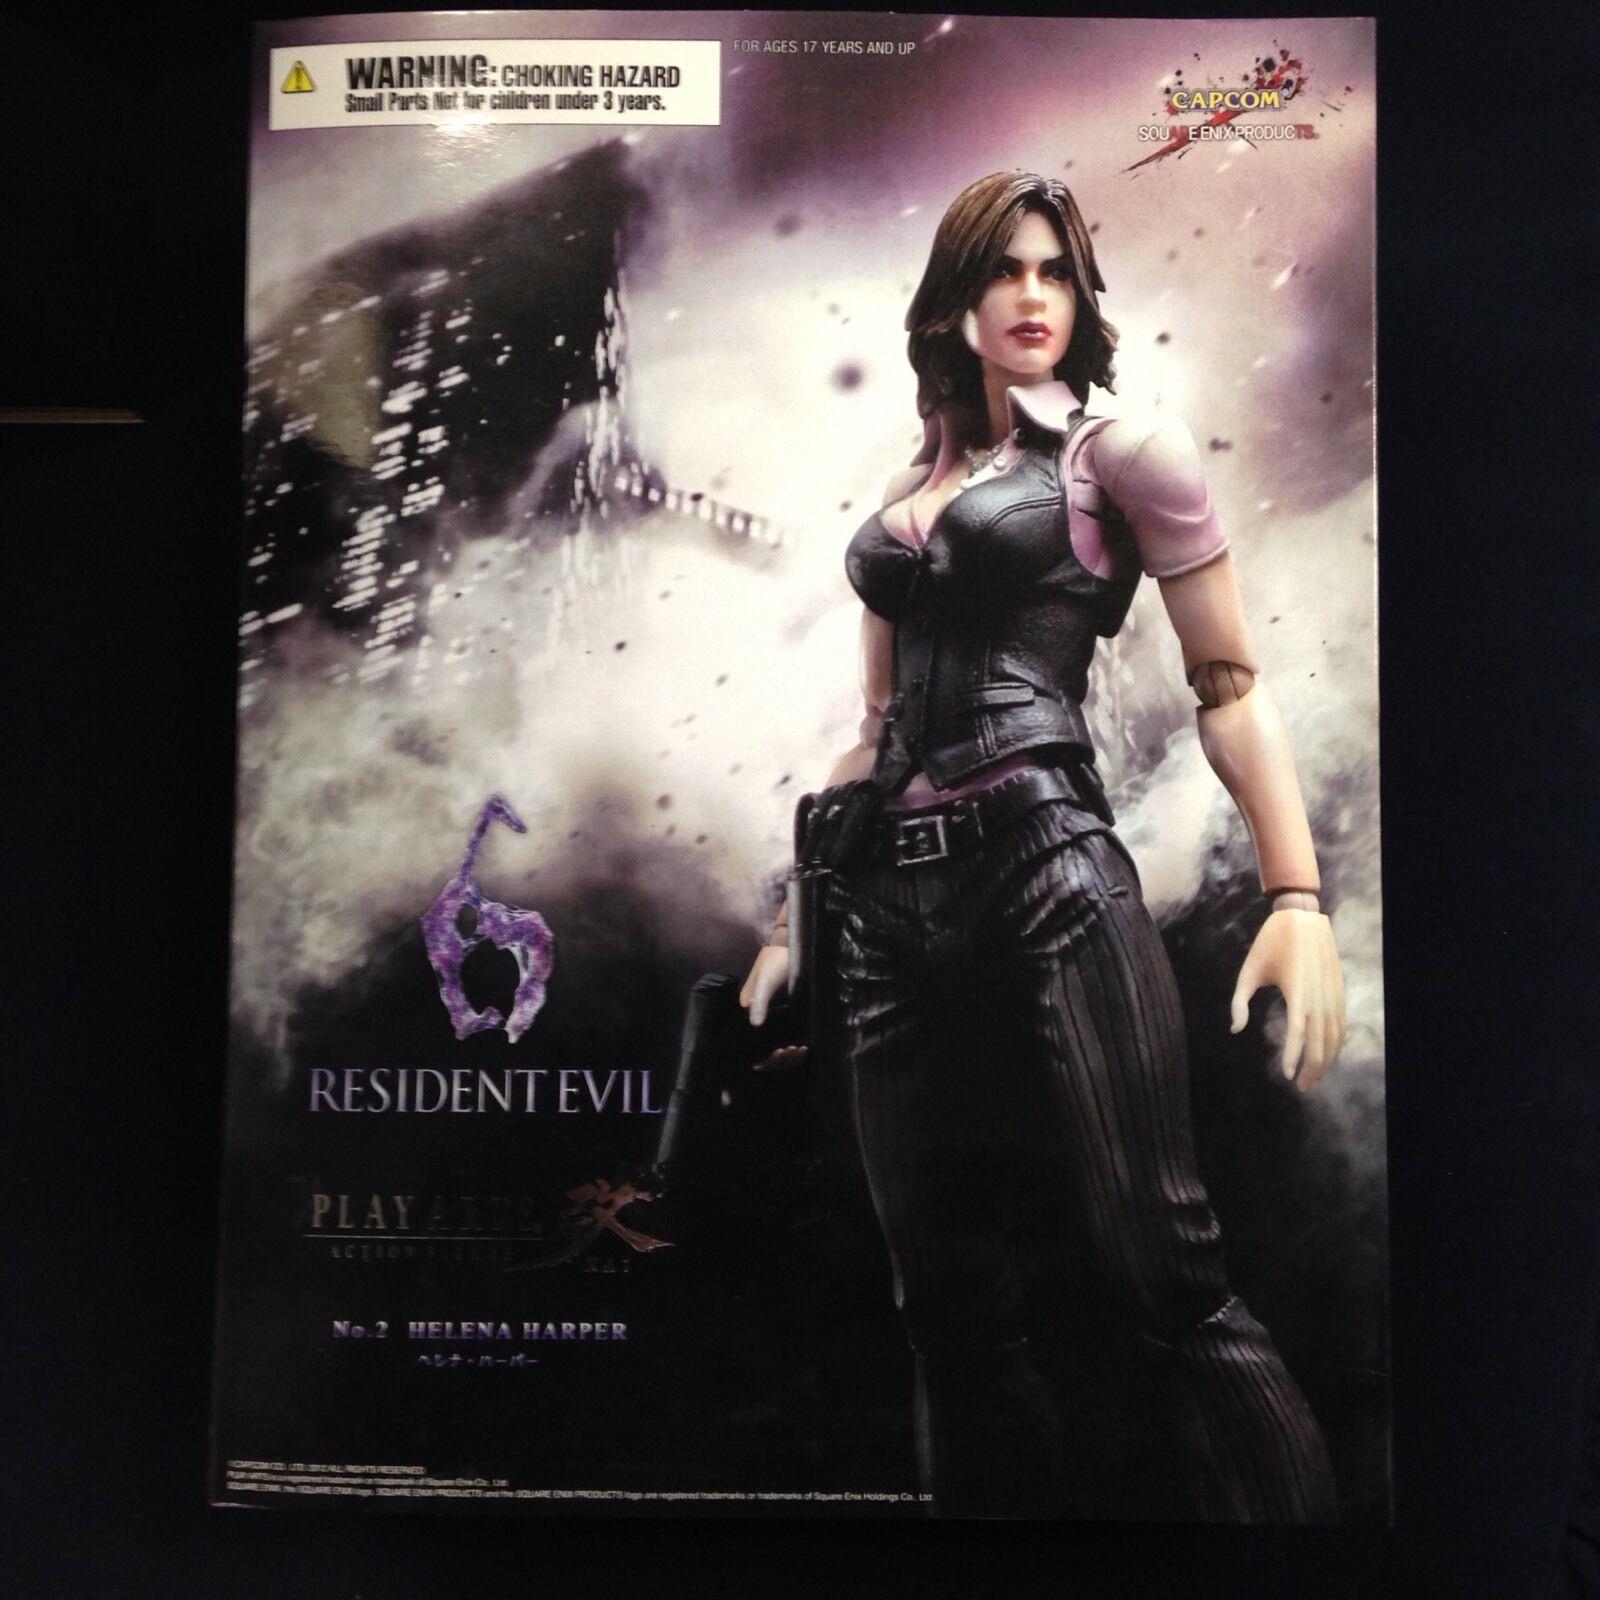 Resident evil 6. helena harper 2 spielen kunst kia square enix